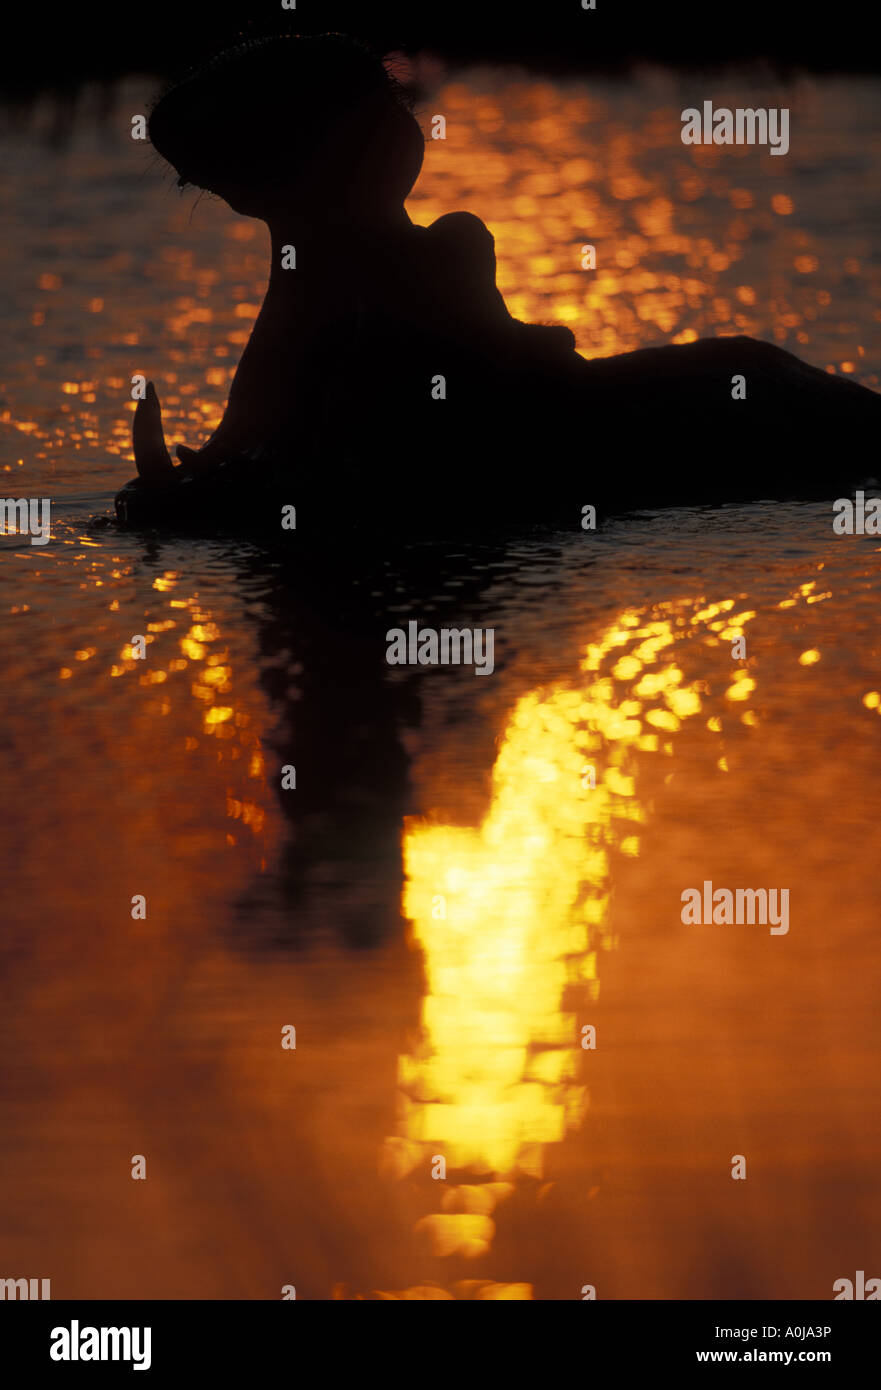 Botswana Moremi Hippopotamus Hippopotamus amphibius yawning in silhouette en piscine au coucher du soleil Banque D'Images